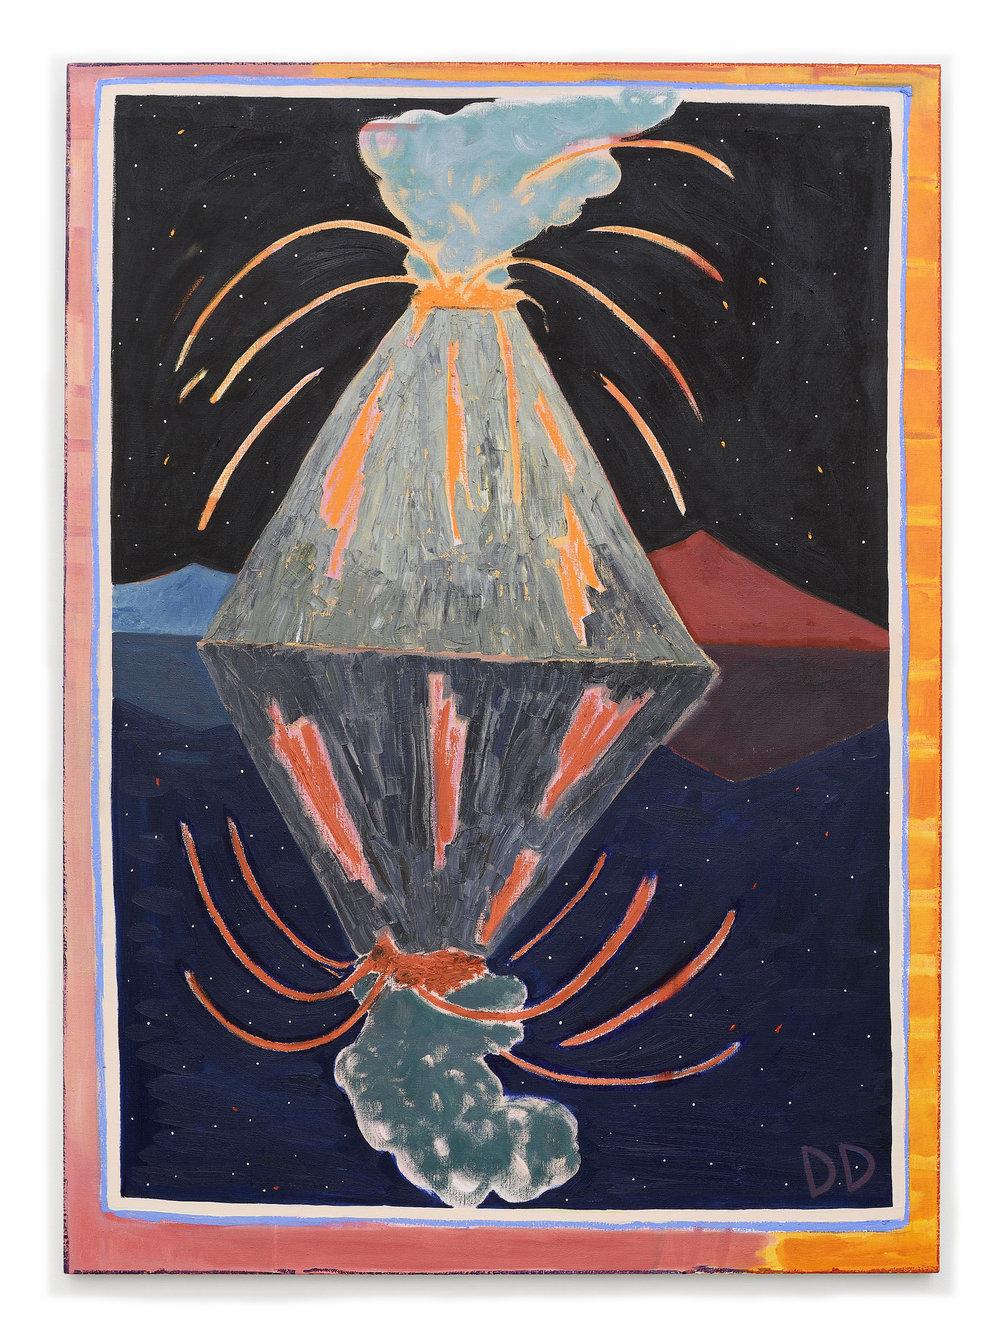 Underwater Cinder Cone  Oil on Flax  130 x 180 cm  2017